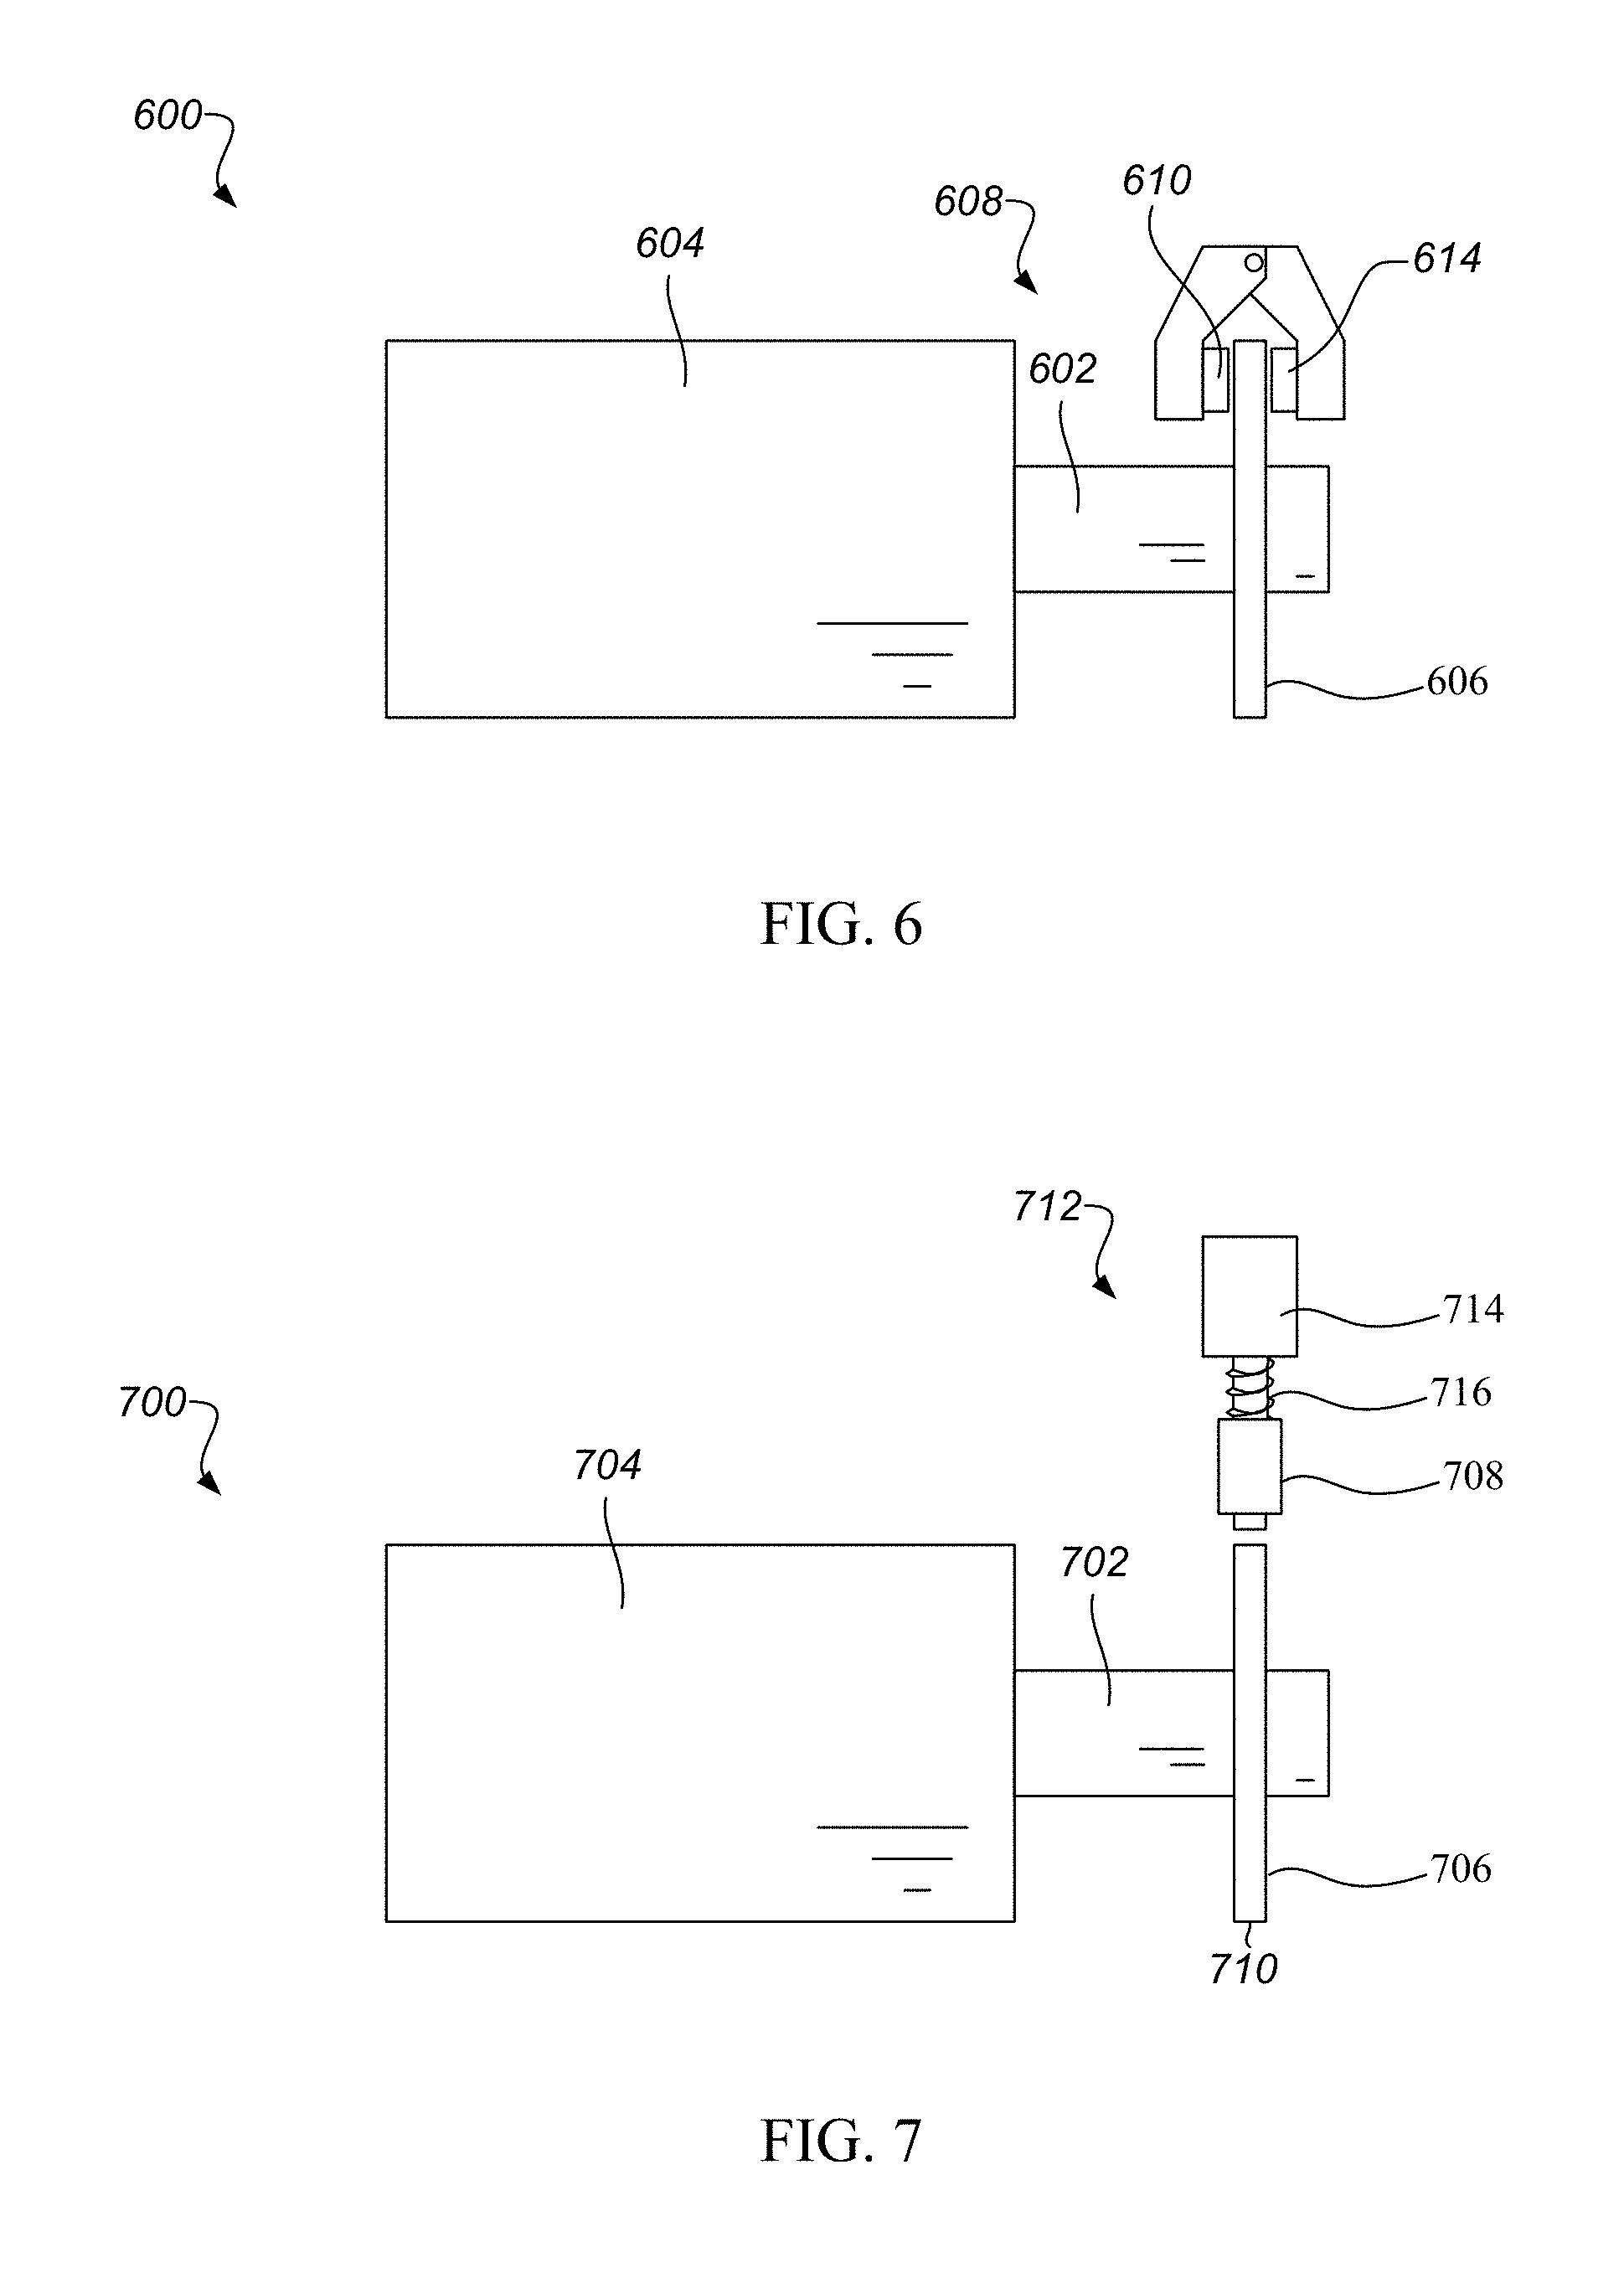 merz drum switch wiring diagram patent us 10 376 736 b2  patent us 10 376 736 b2